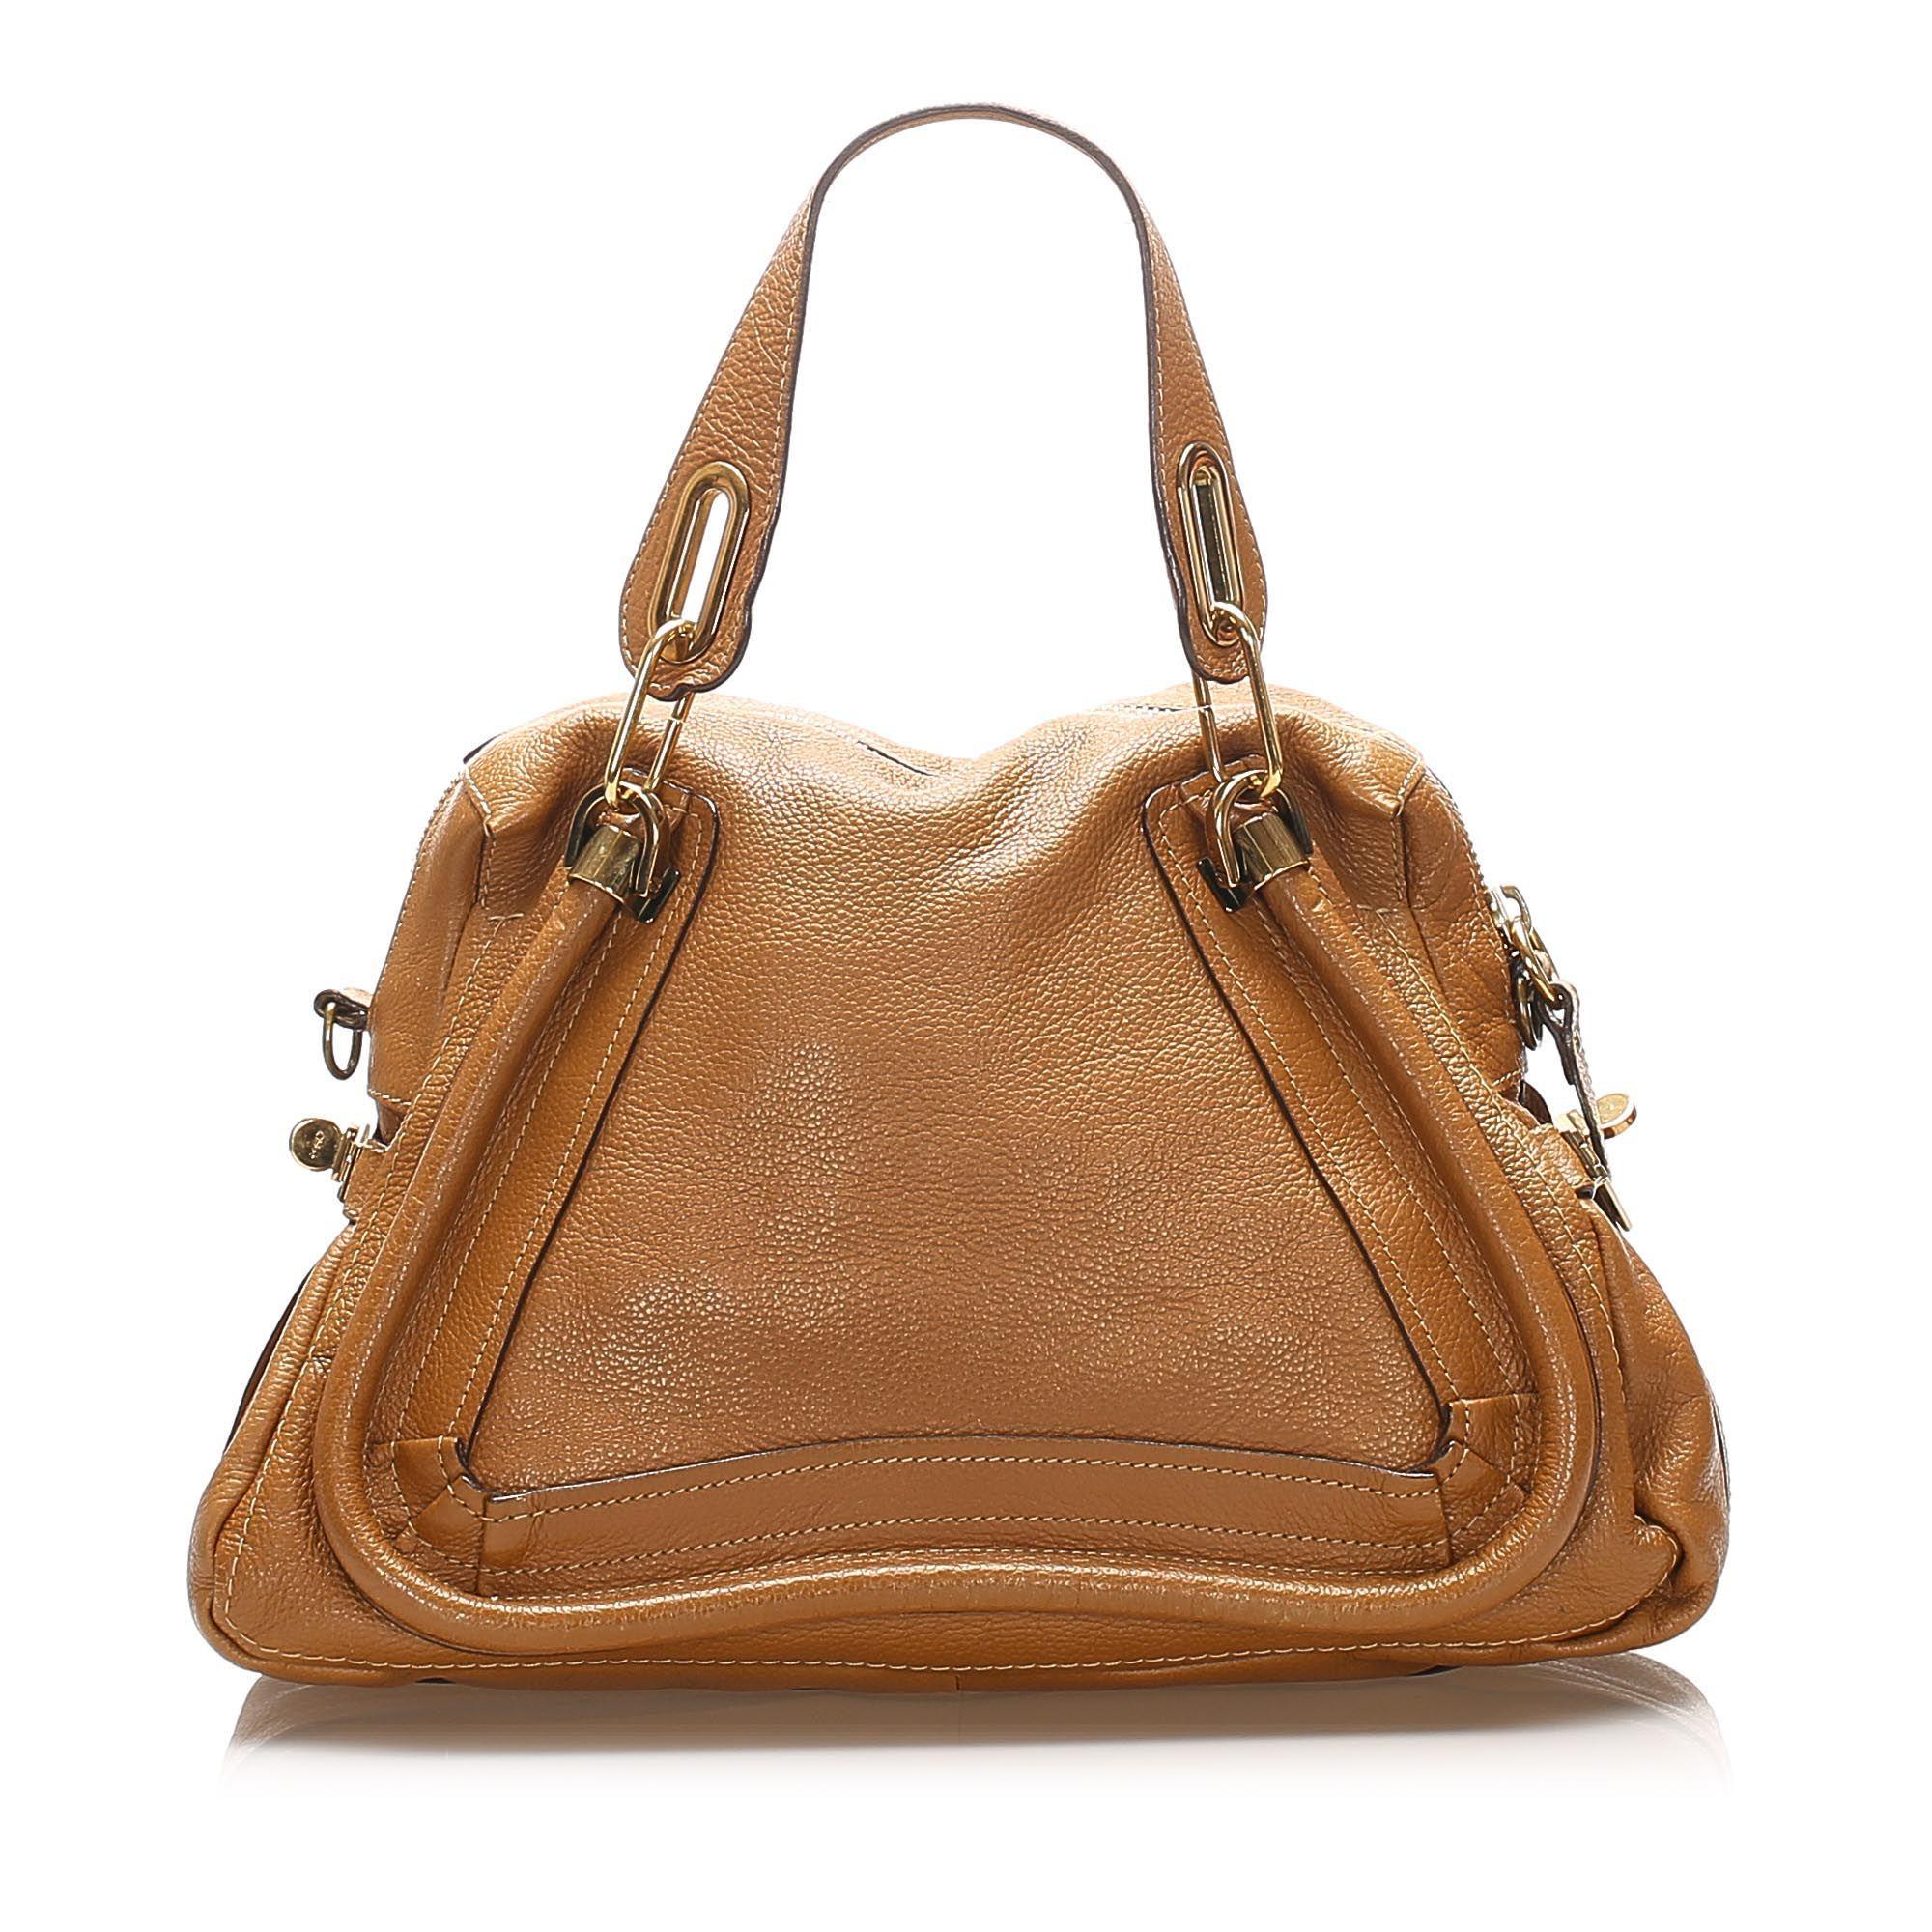 Vintage Chloe Paraty Leather Satchel Brown